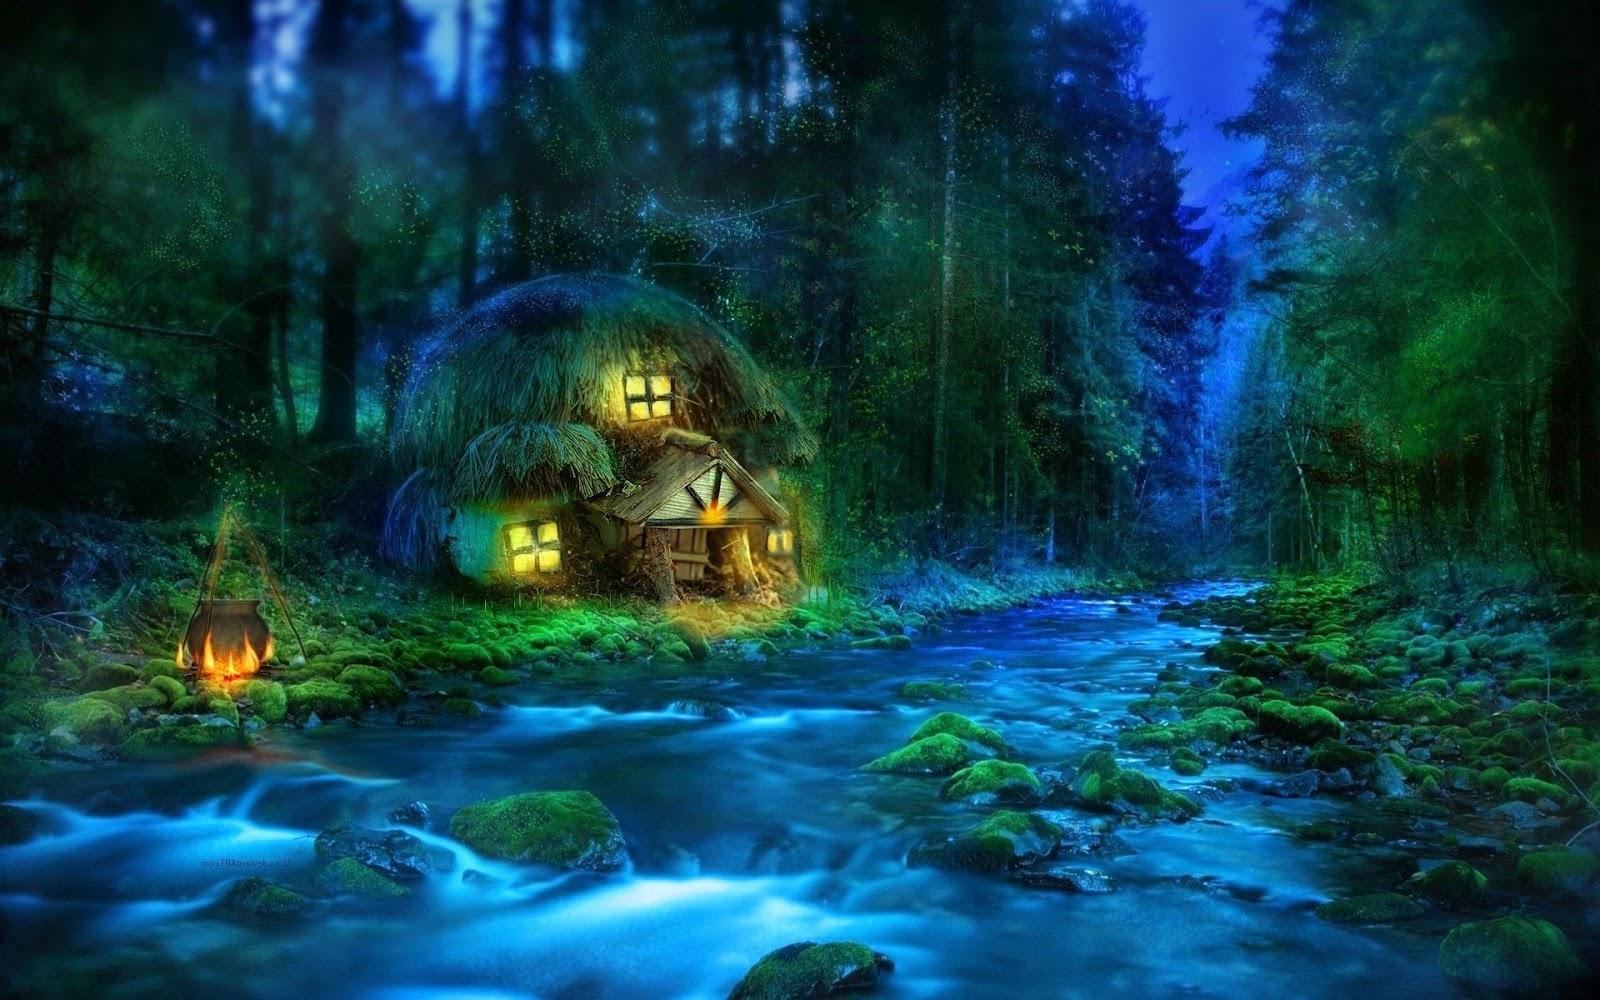 Fantasie wallpaper met rivier en huisje